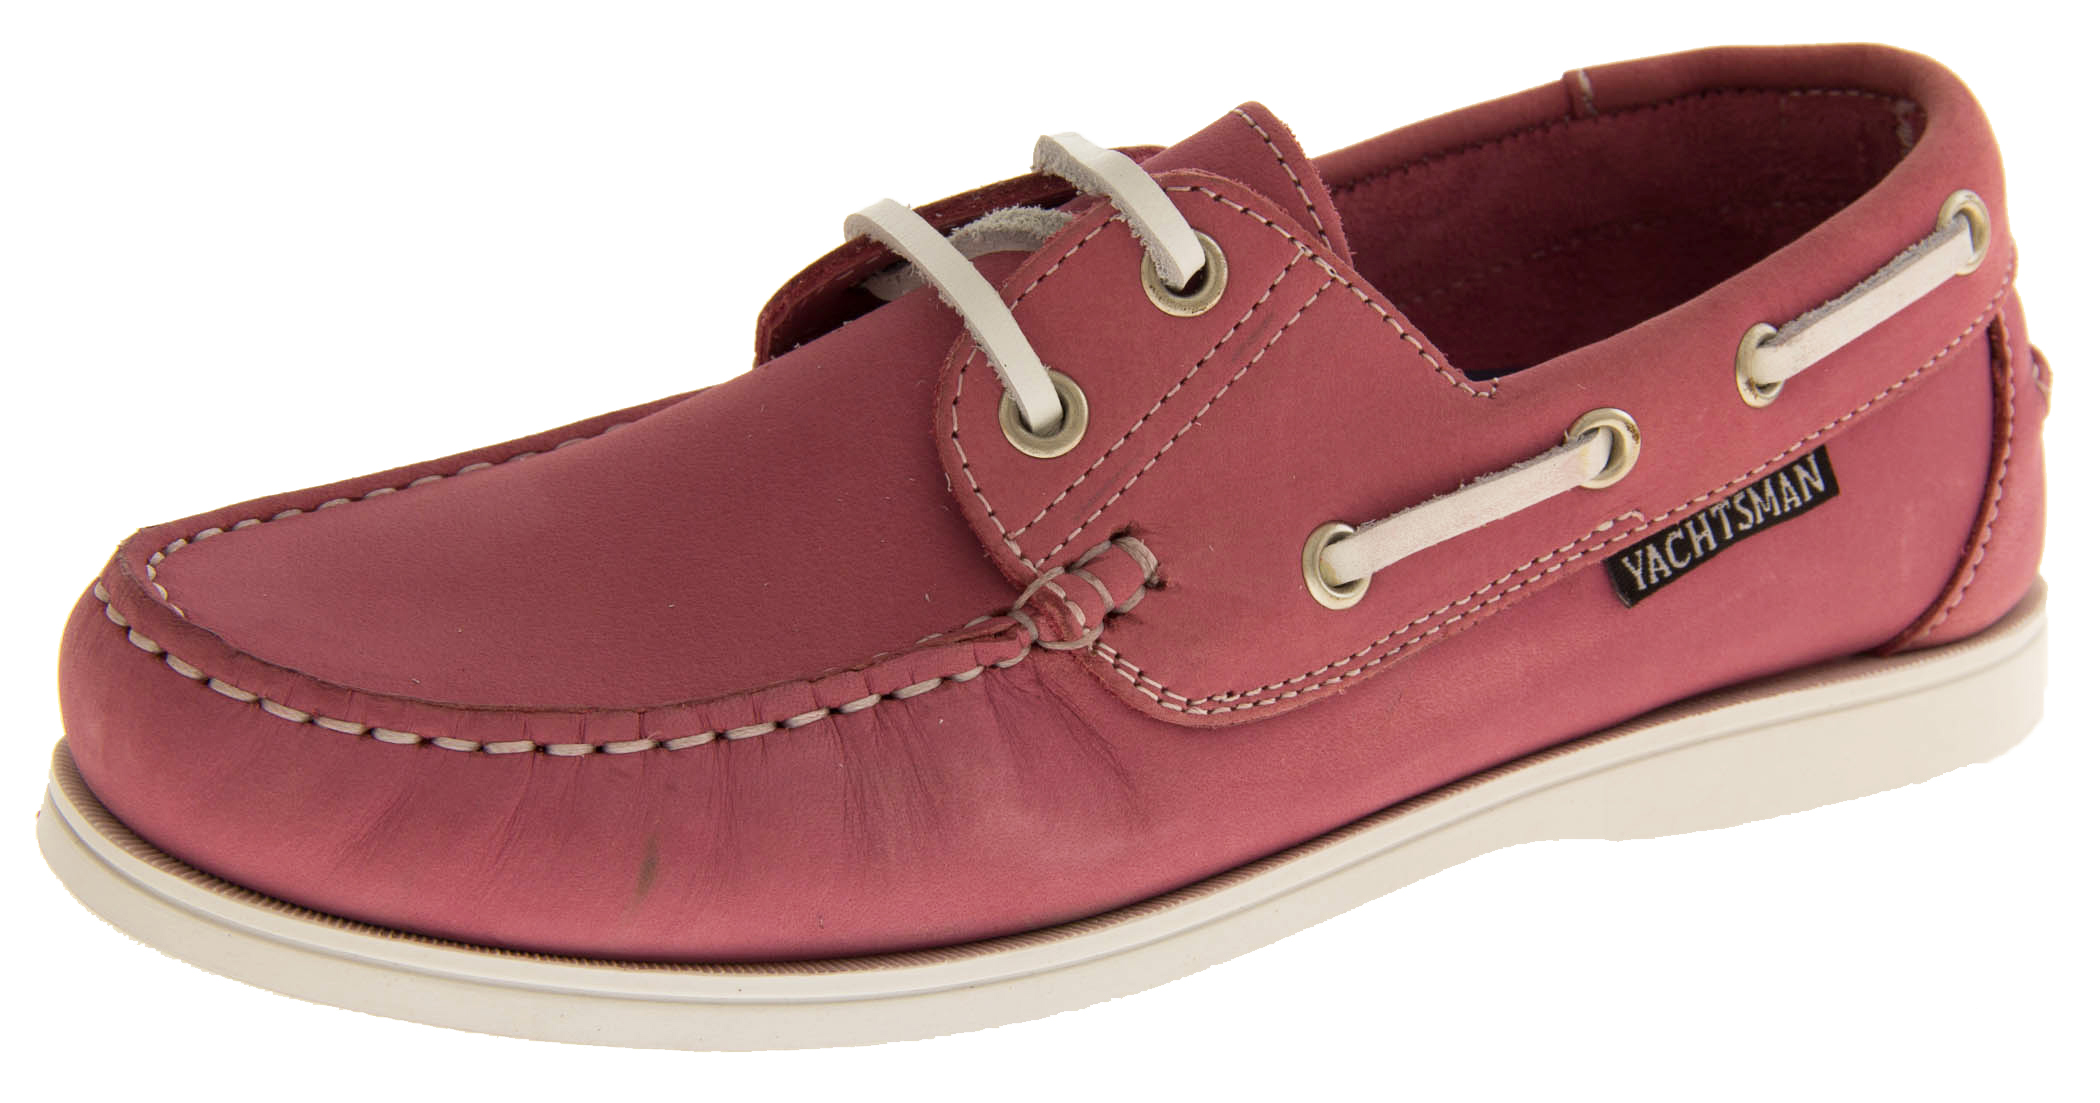 566499d380 Womens YACHTSMAN Leather Sailing Deck Shoes